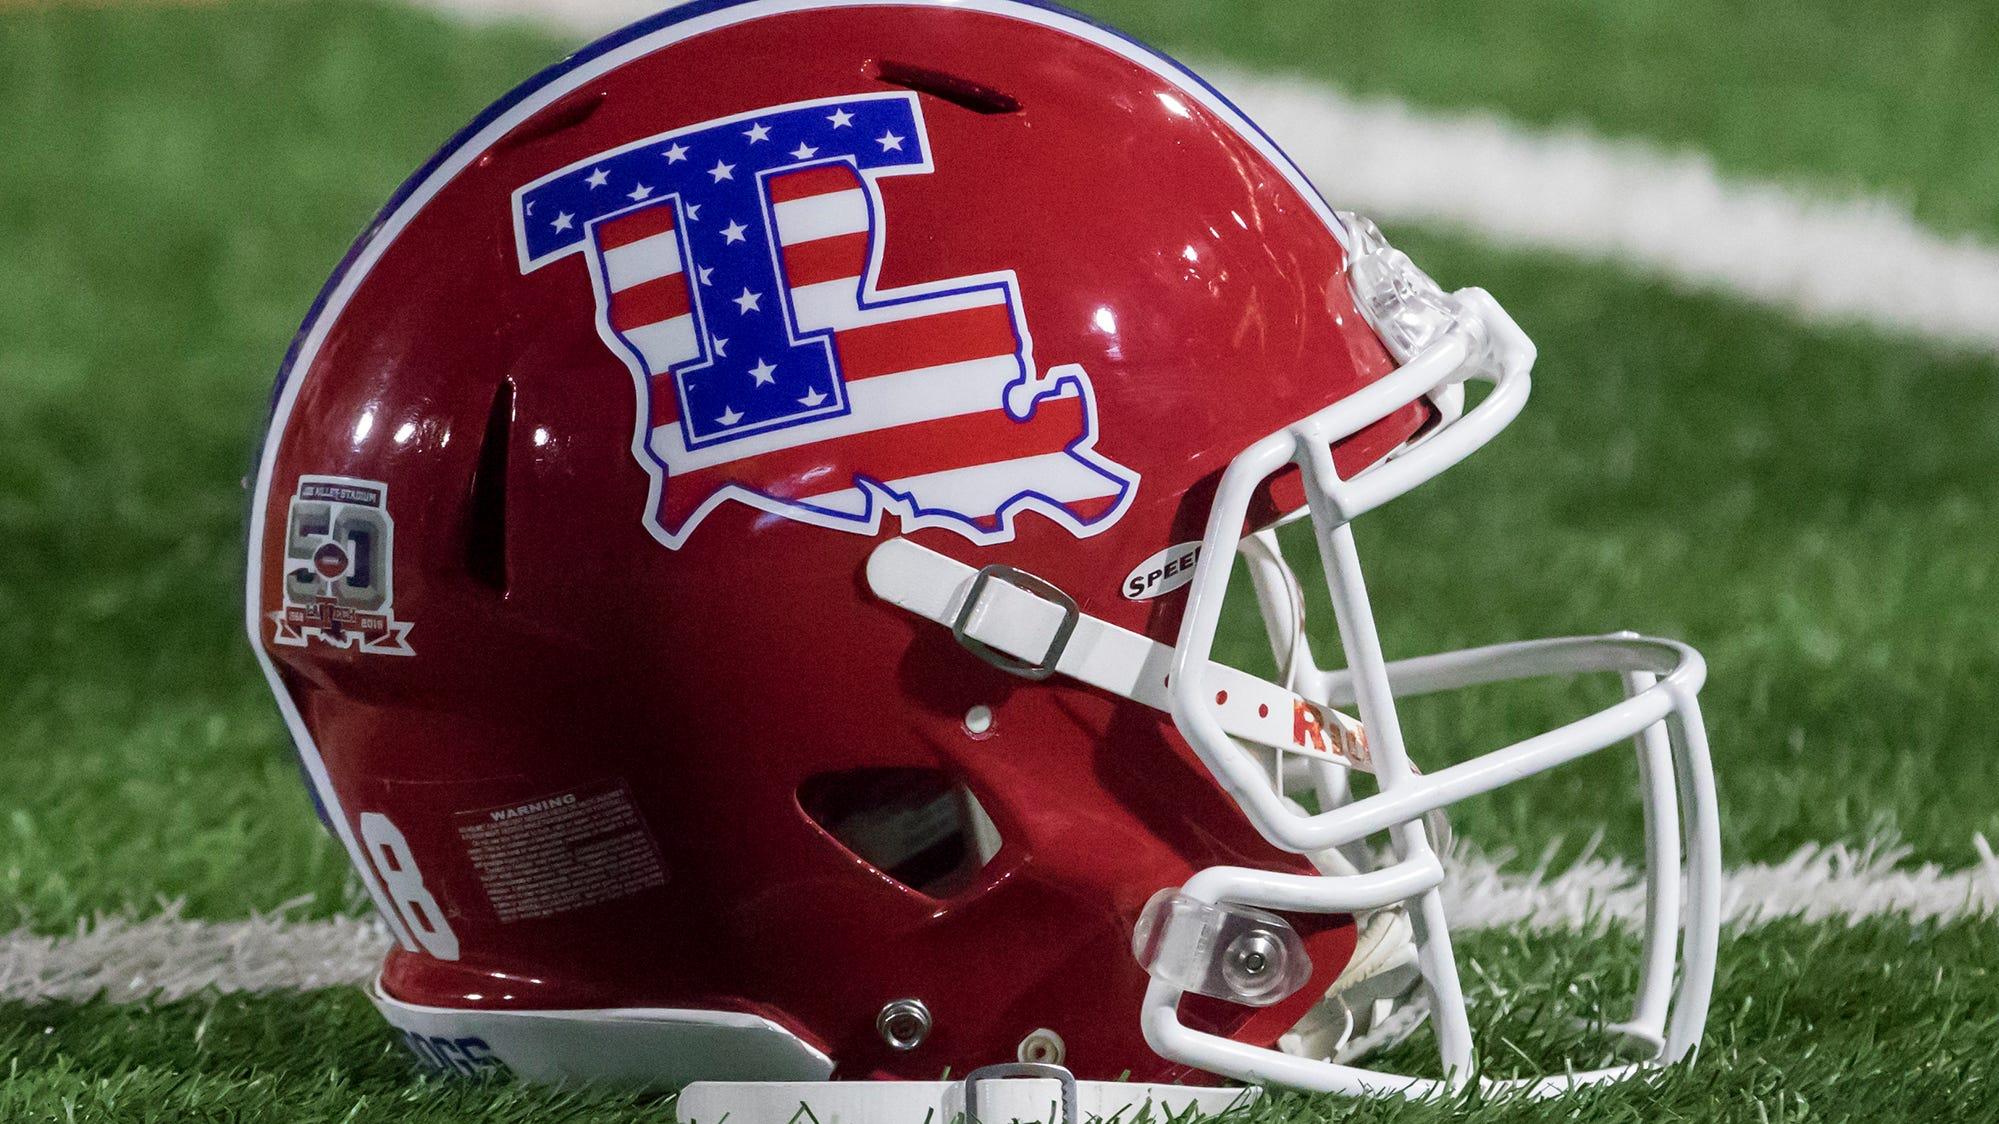 Louisiana Tech Lands Fiu Marshall Cross Division 2019 20 League Games